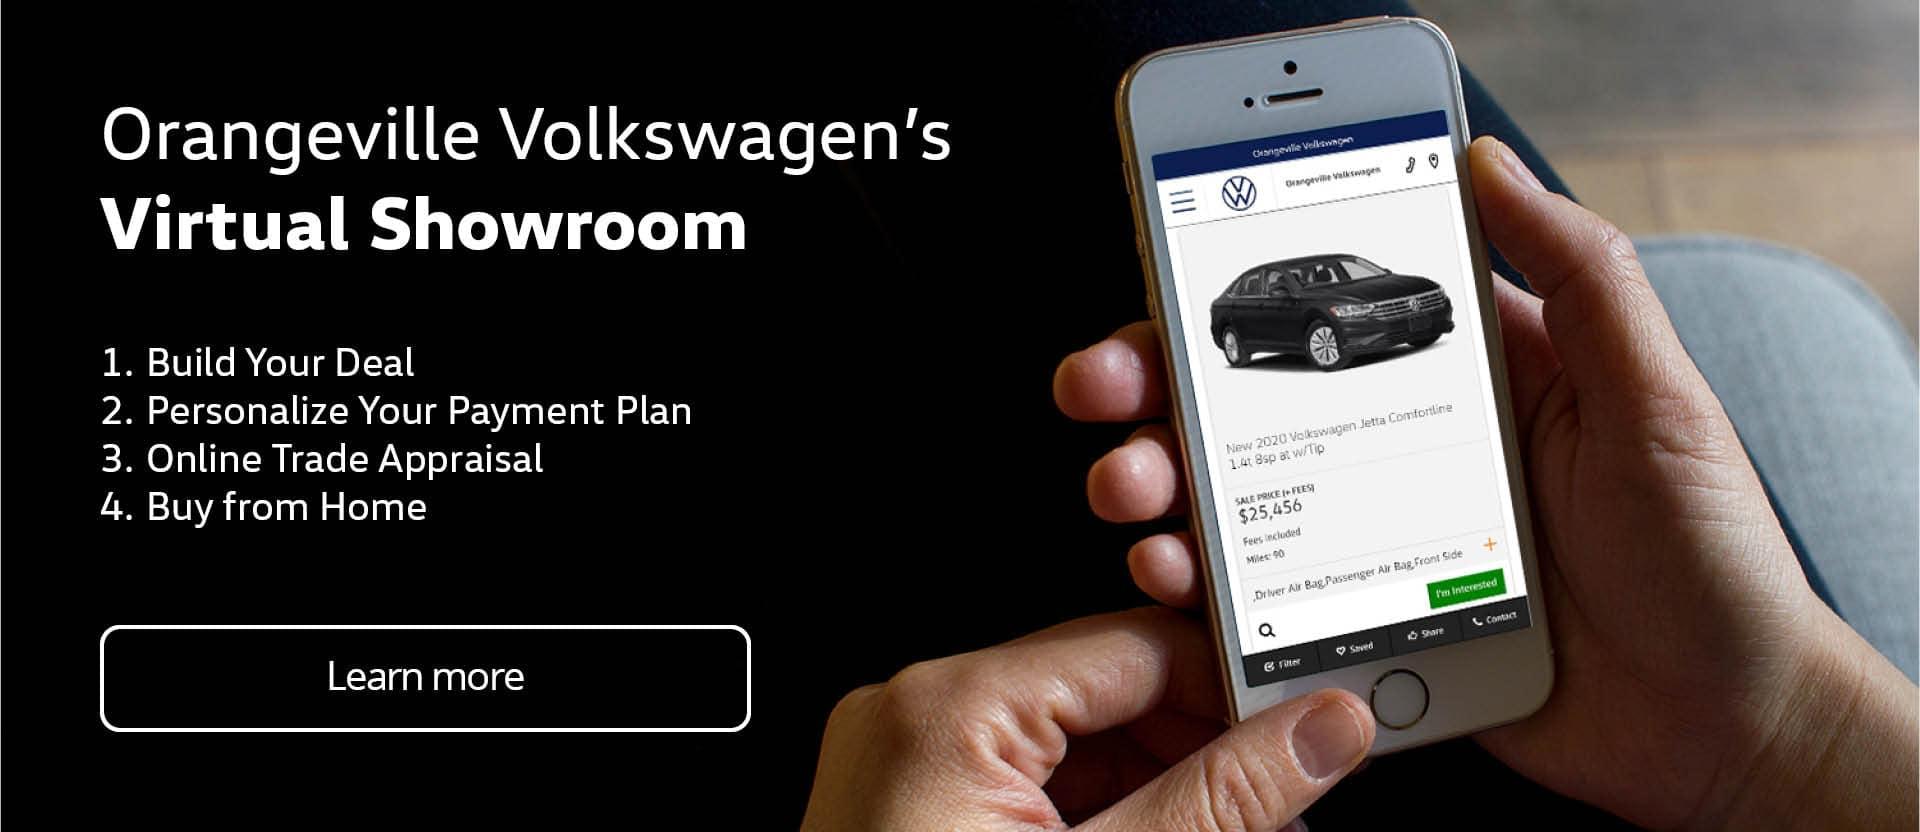 Orangeville VW Virtual Showroom